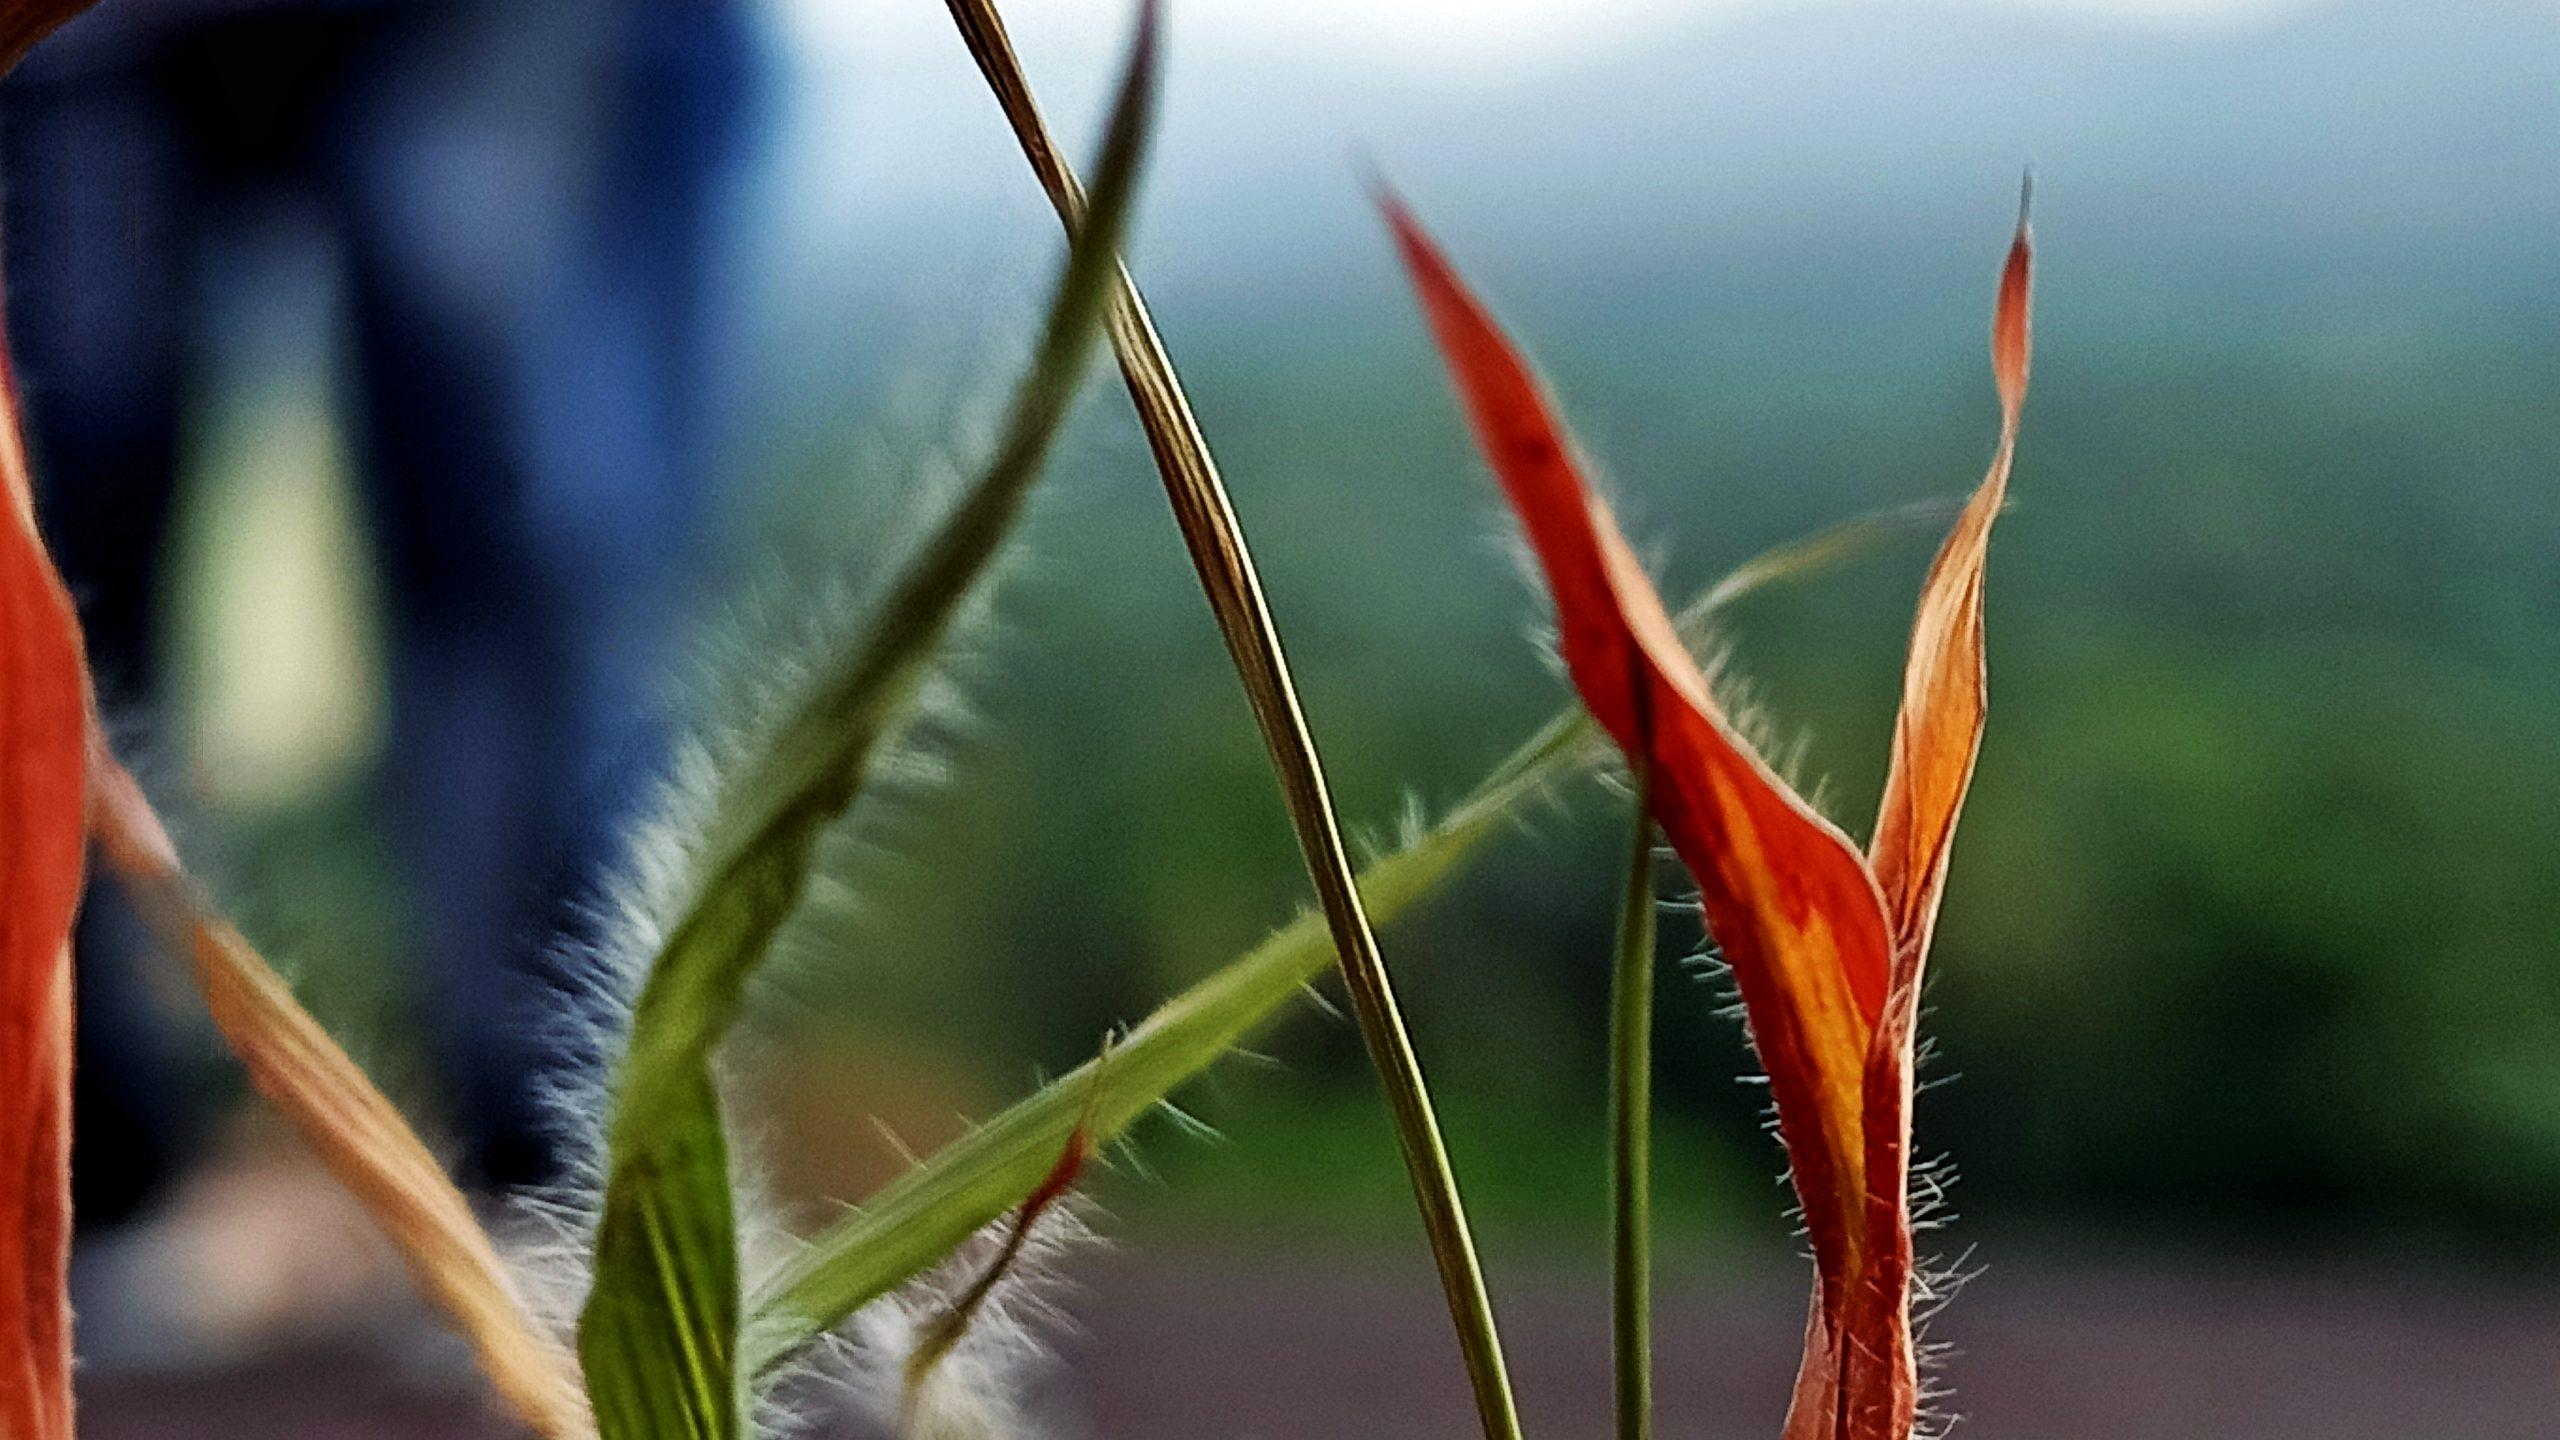 Grass Leaves on Focus